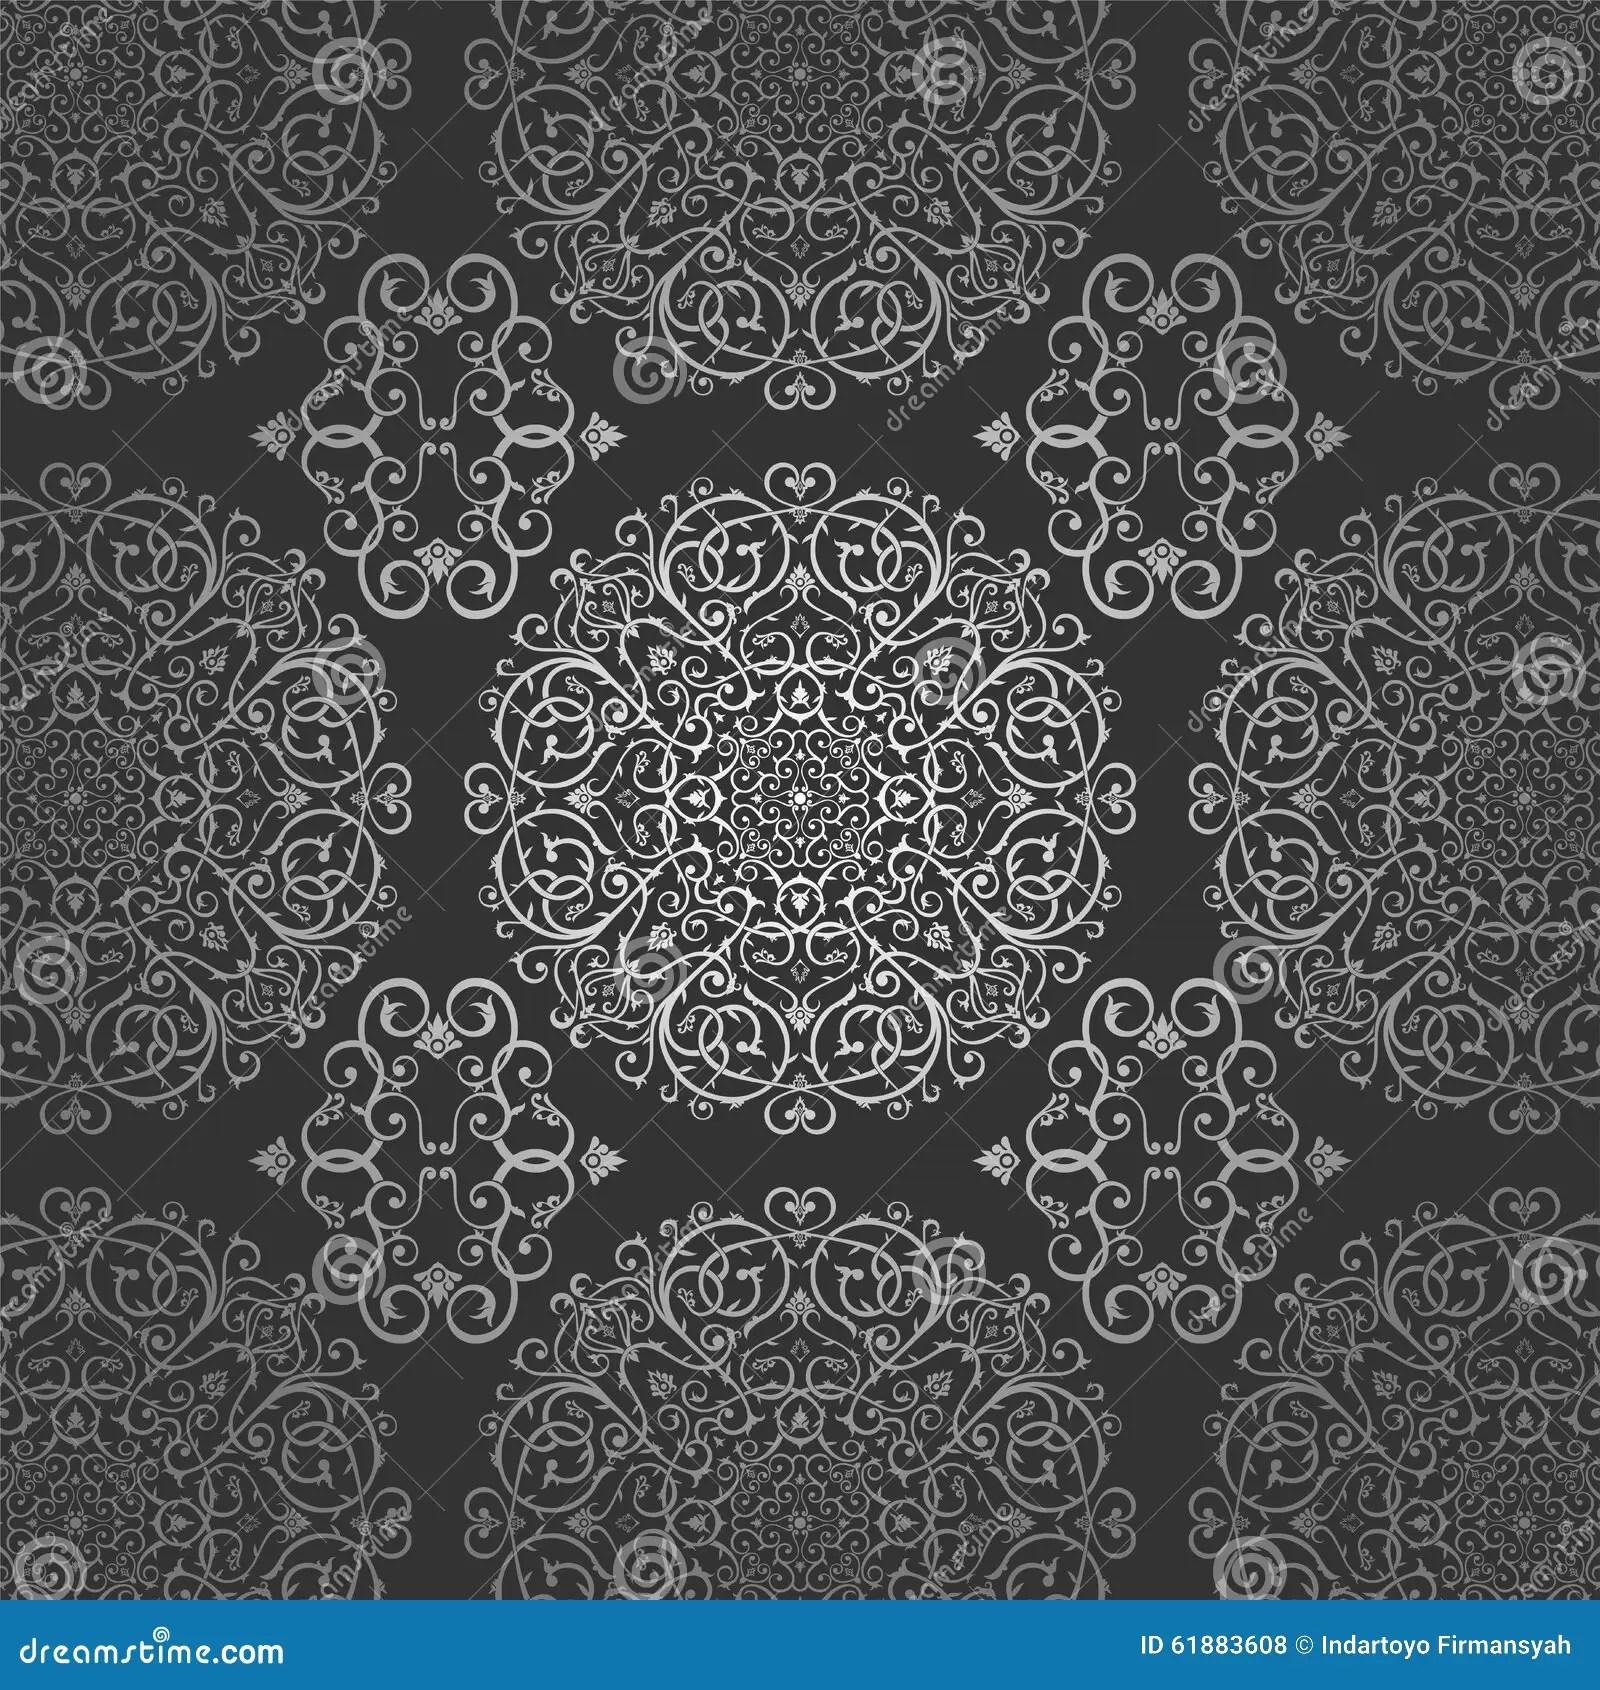 Wallpaper Arabic Batik Circle Floral Dark Silver Pattern